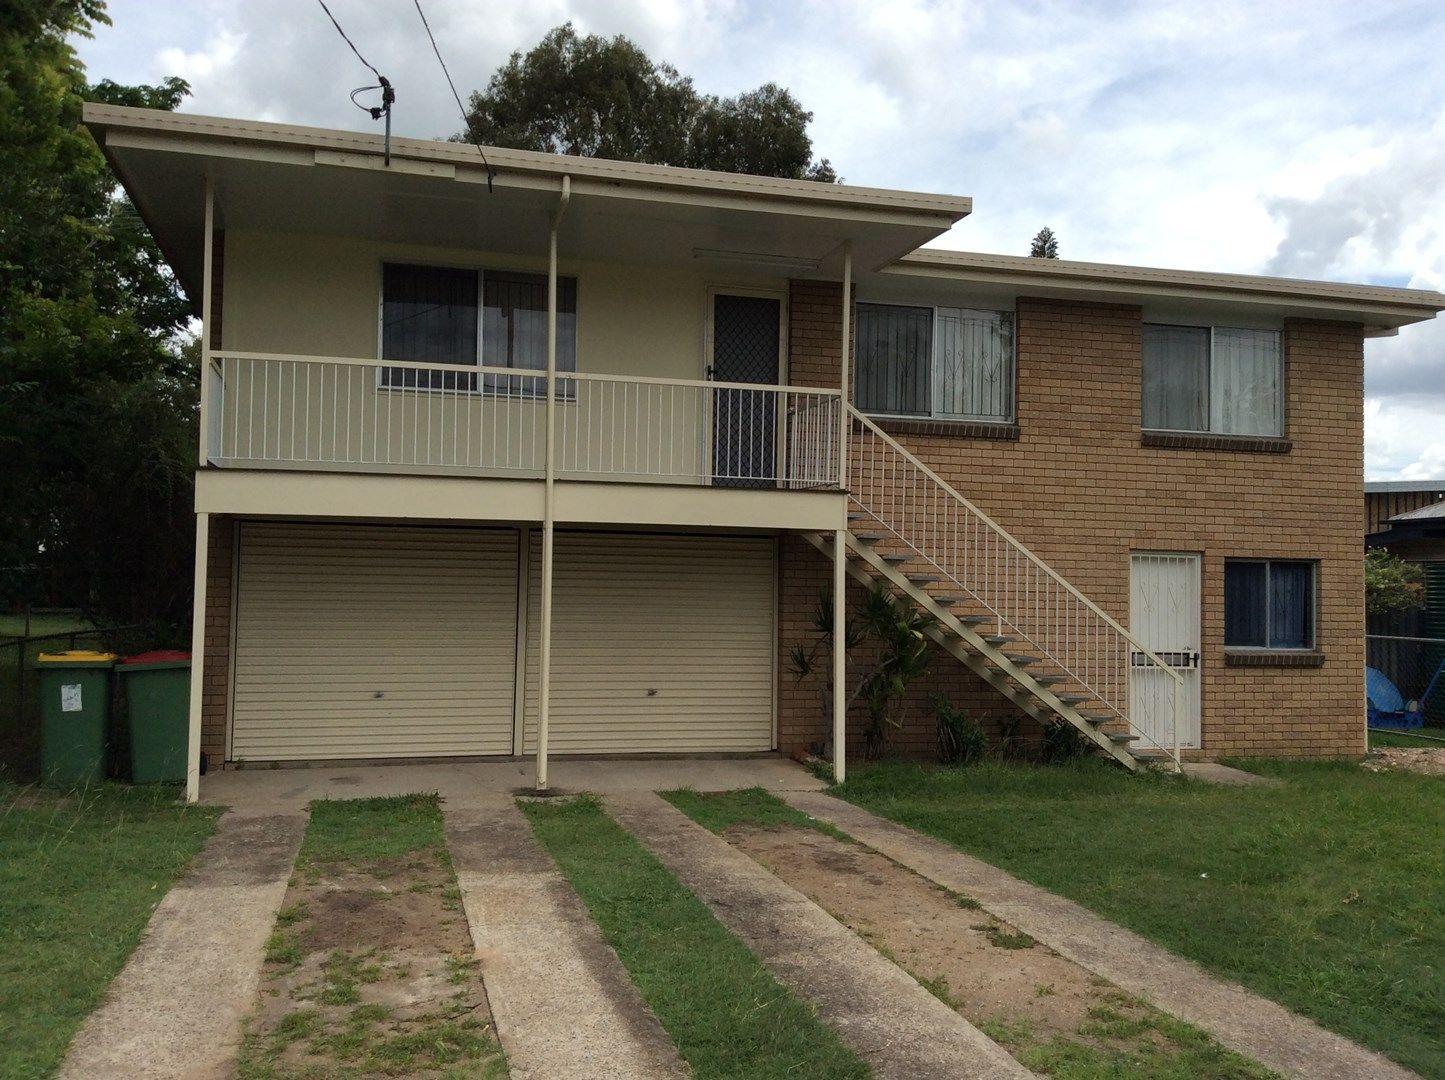 4A Goodwin St, Basin Pocket QLD 4305, Image 0